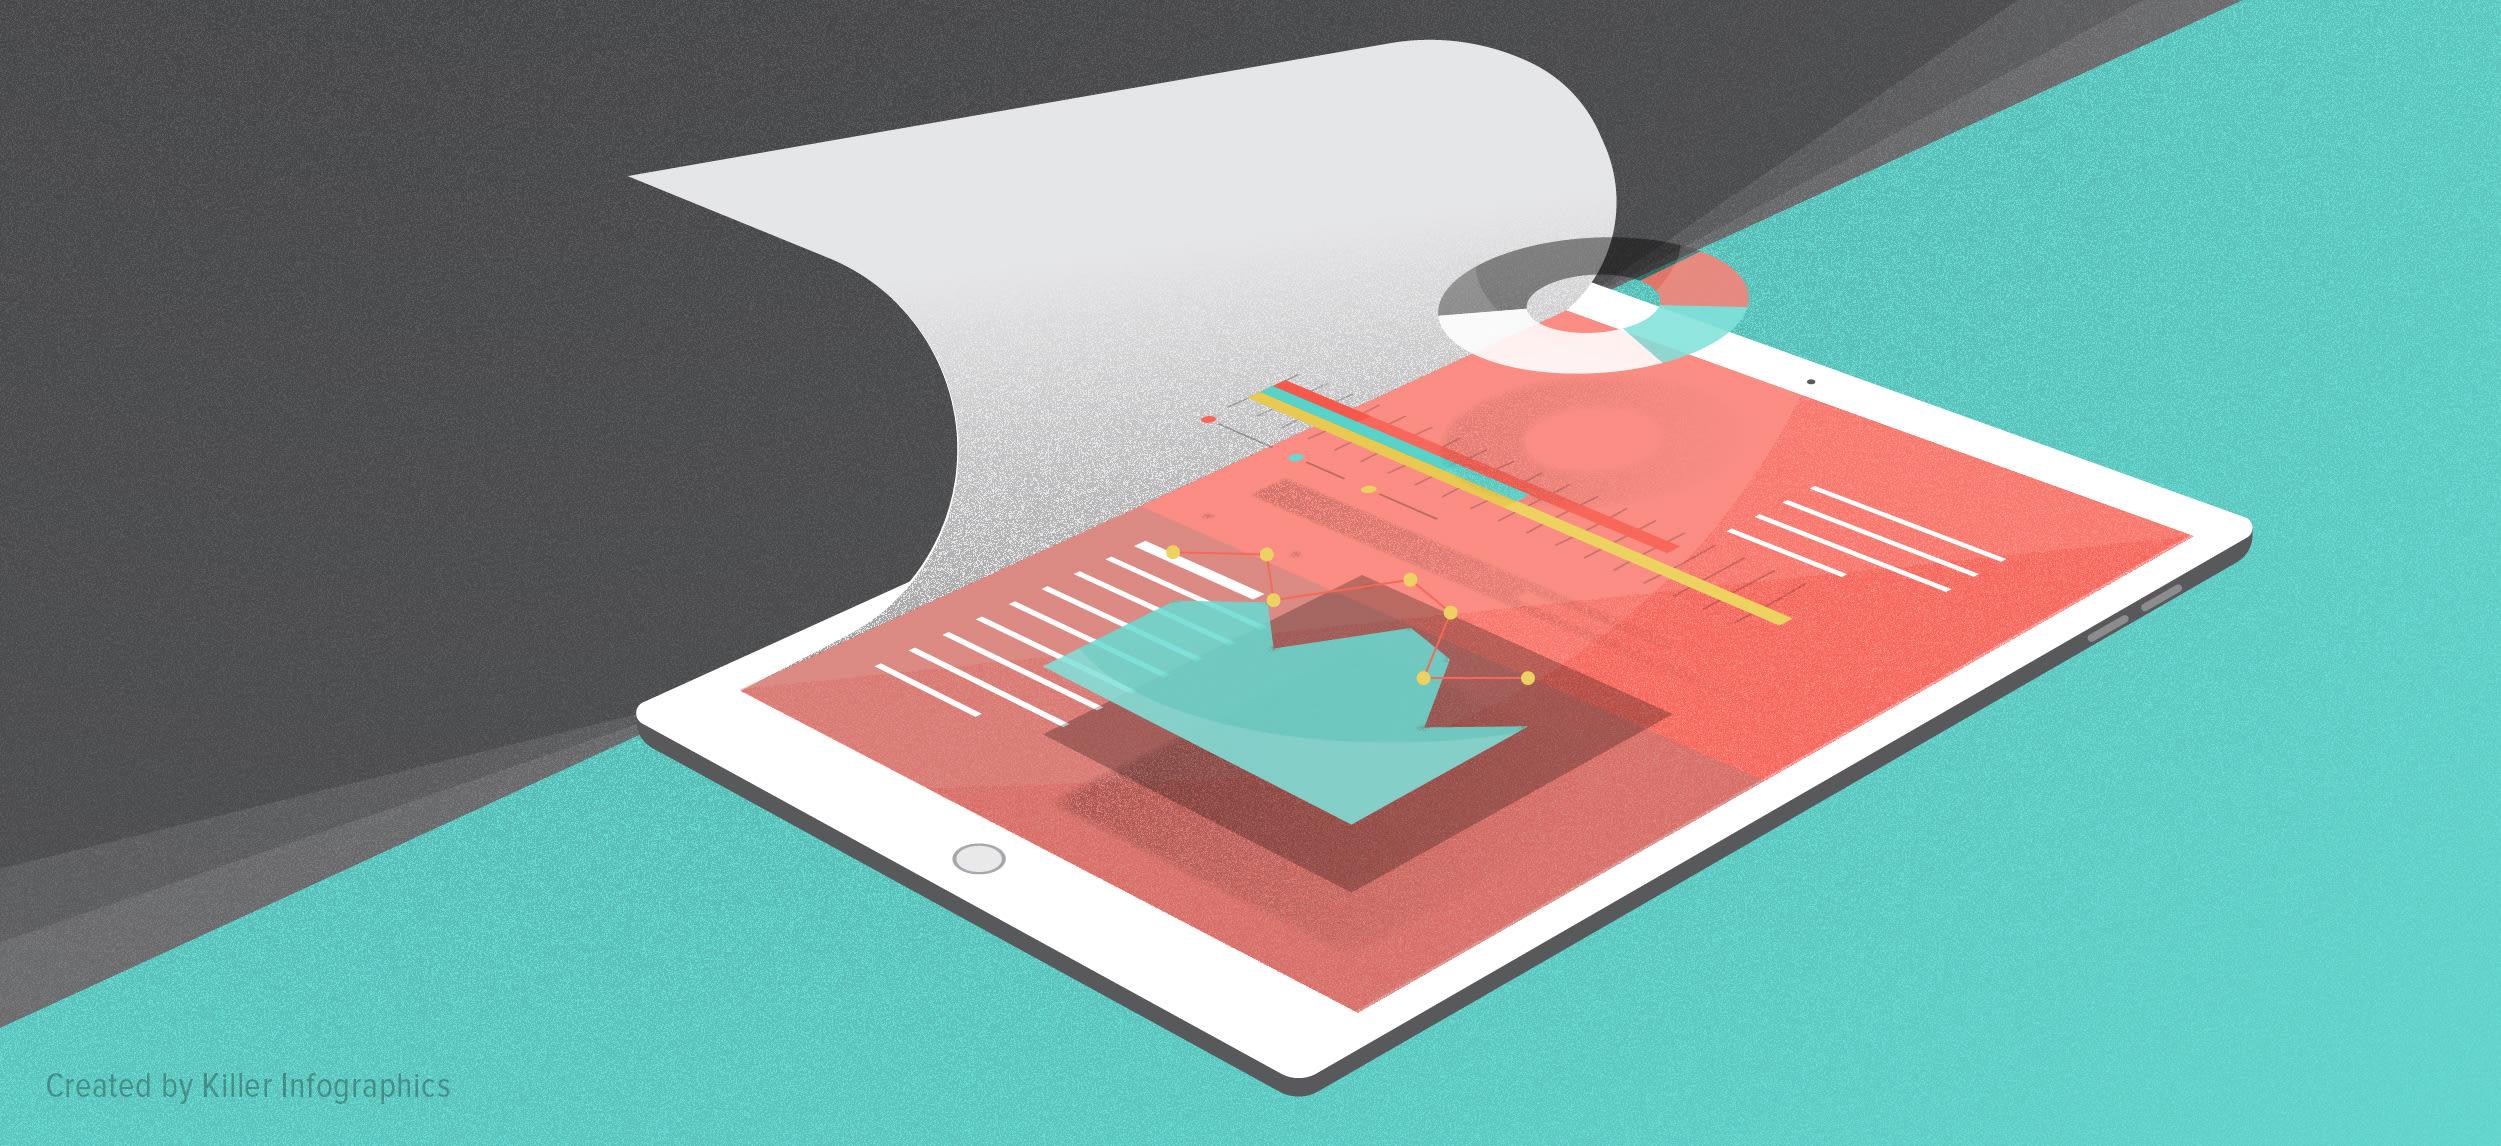 Killer Infographics eBook Visual Communication